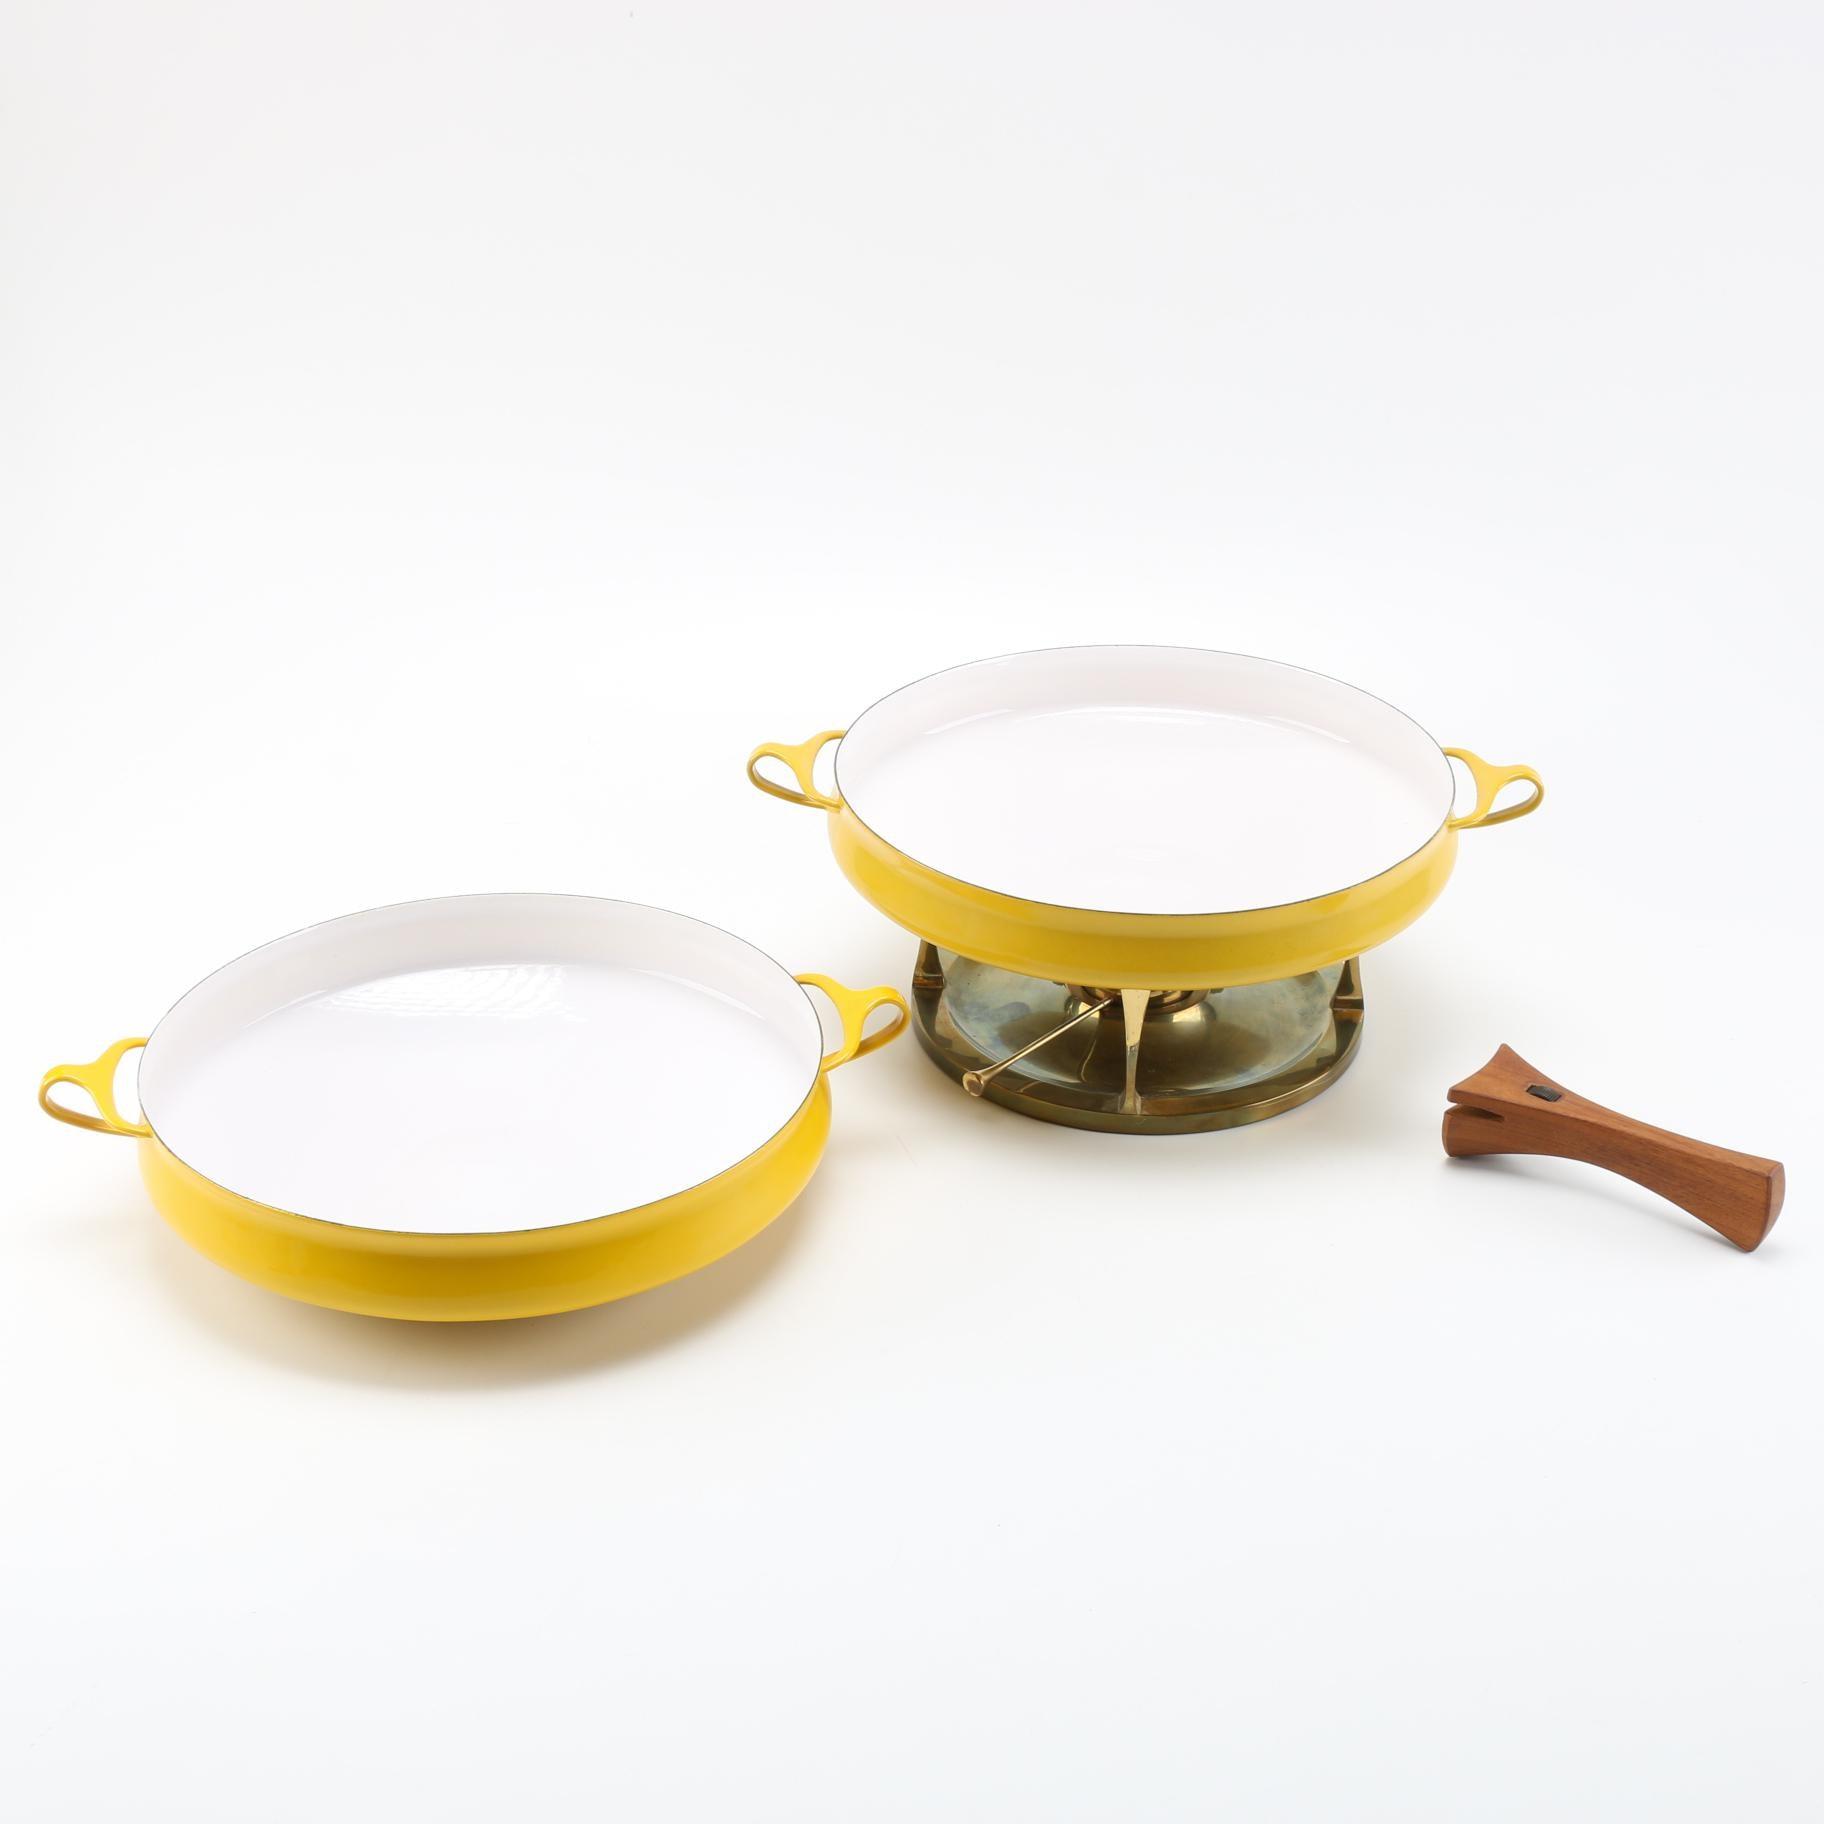 Dansk Kobenstyle Paella Pans With Burner and Teak Handle